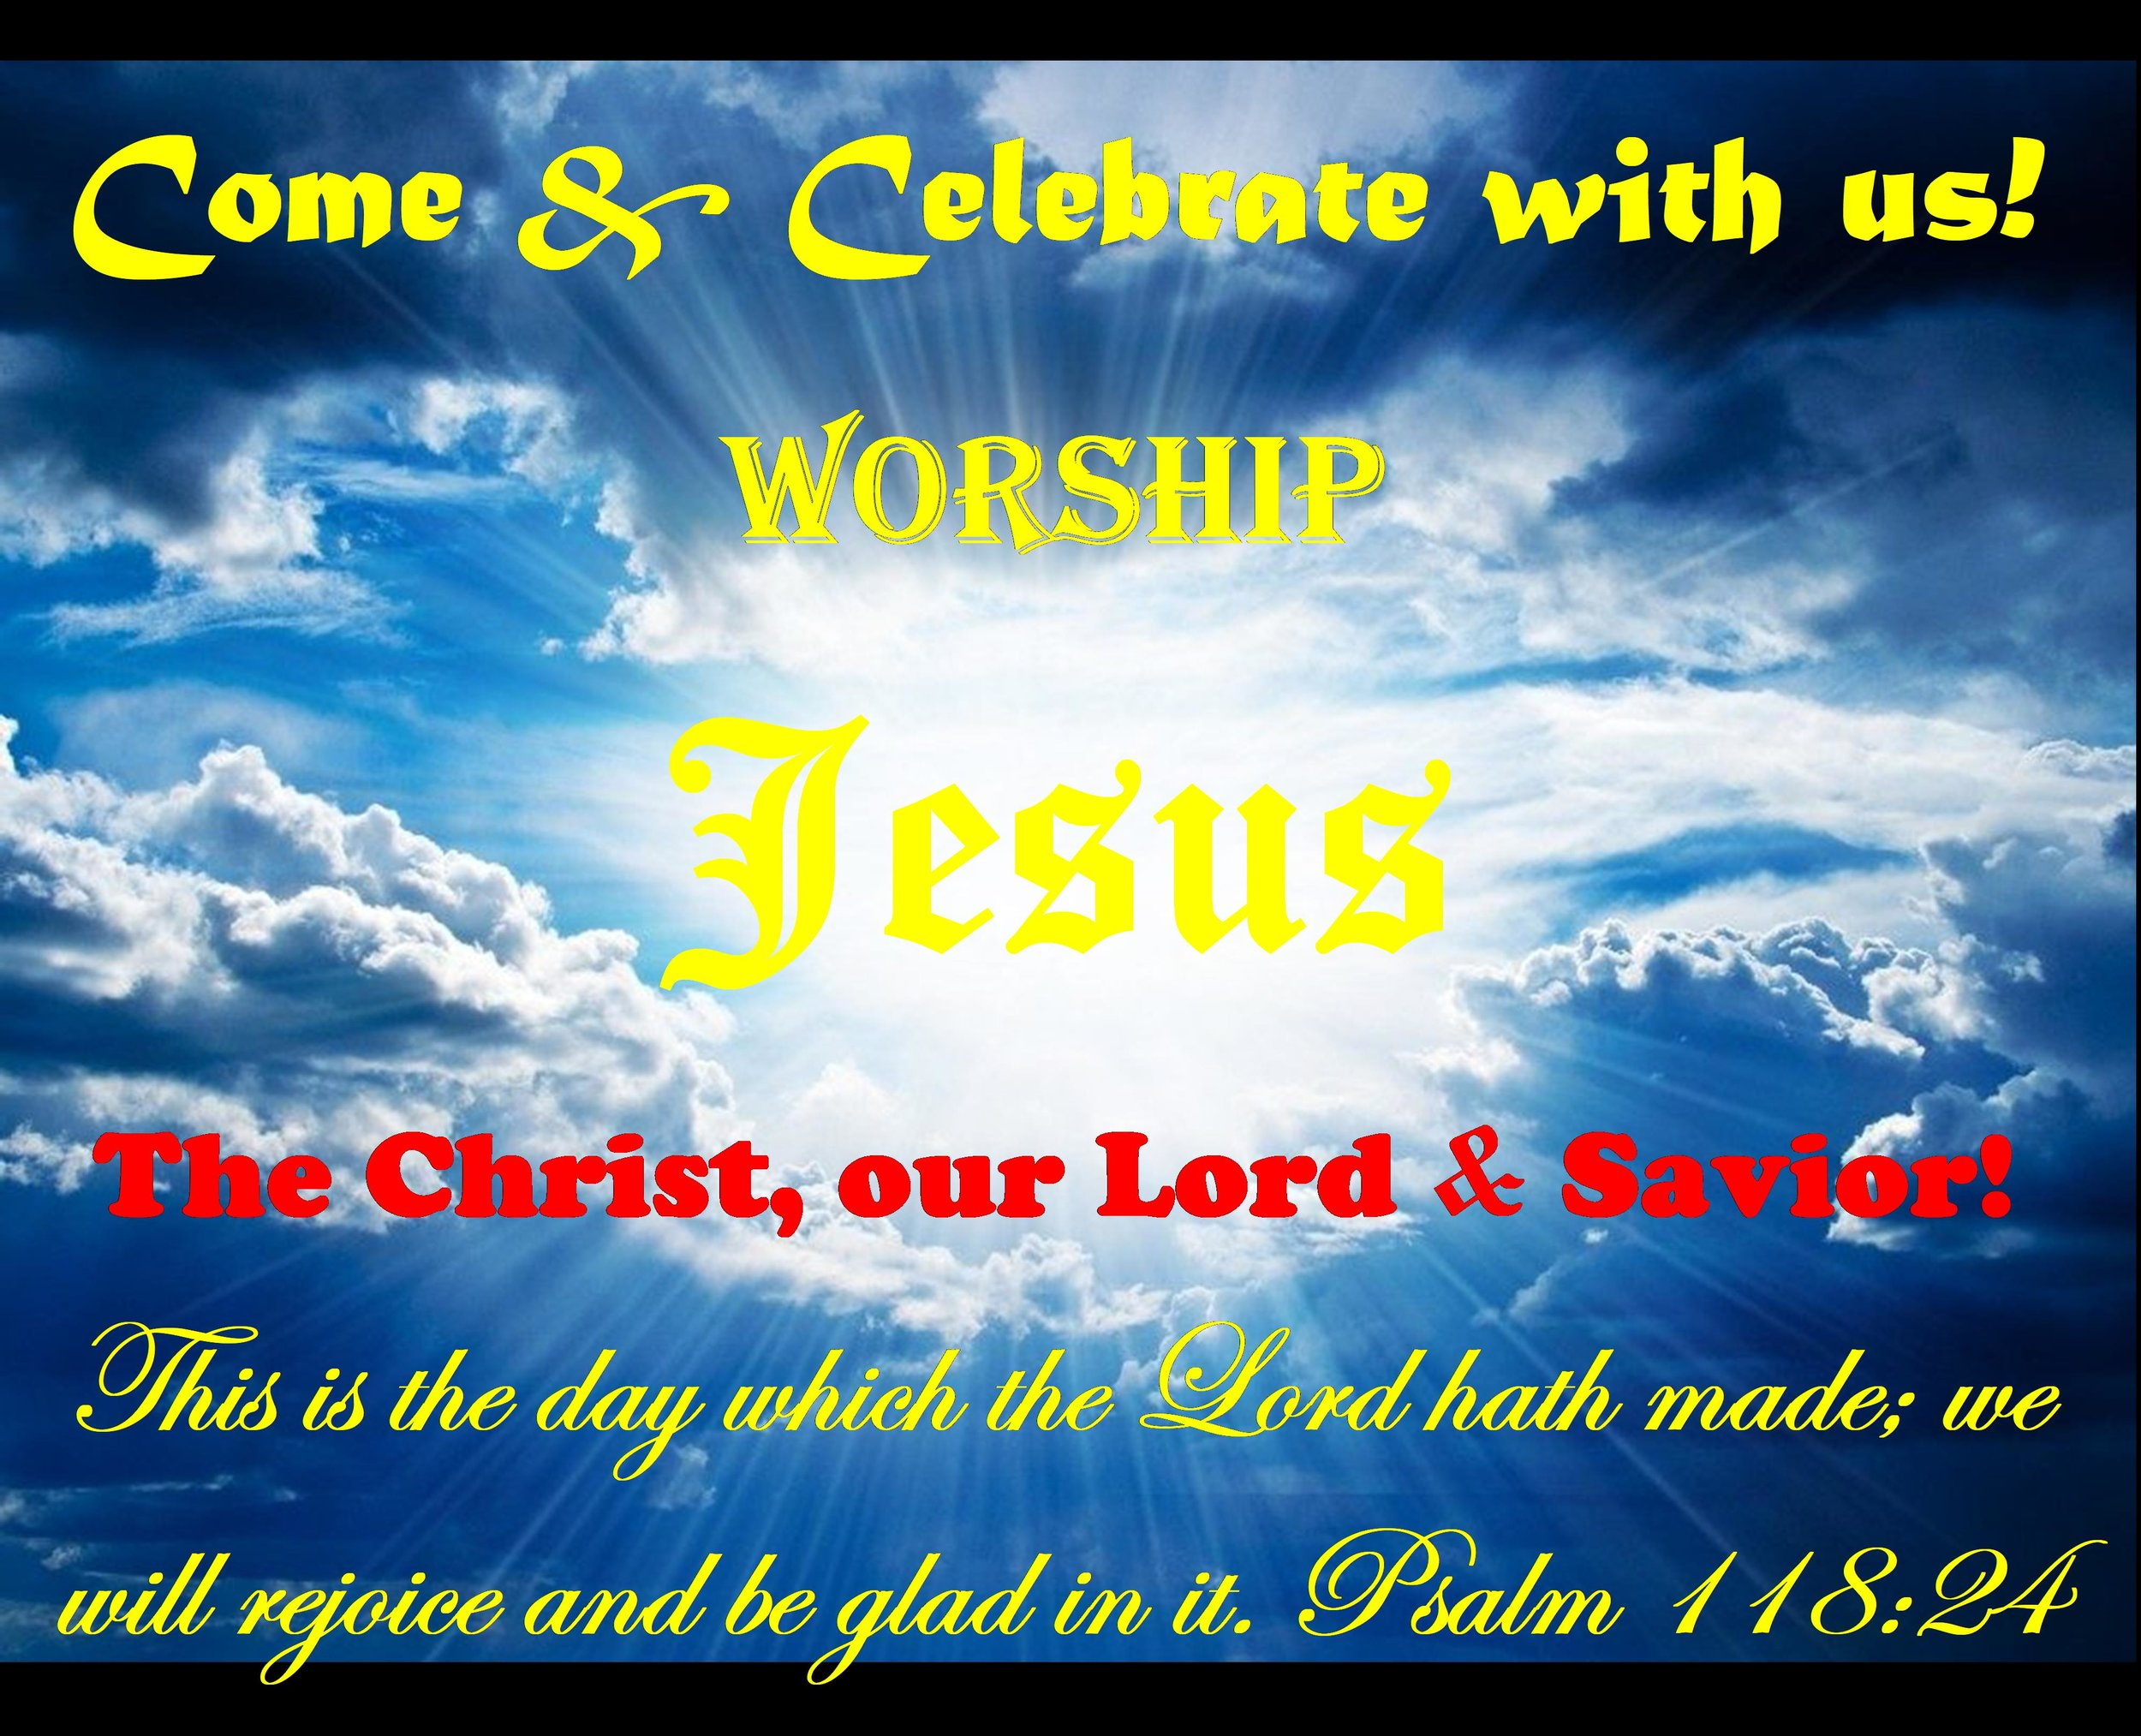 SUNDAY WORSHIP SERVICE @ 10:30 a.m.